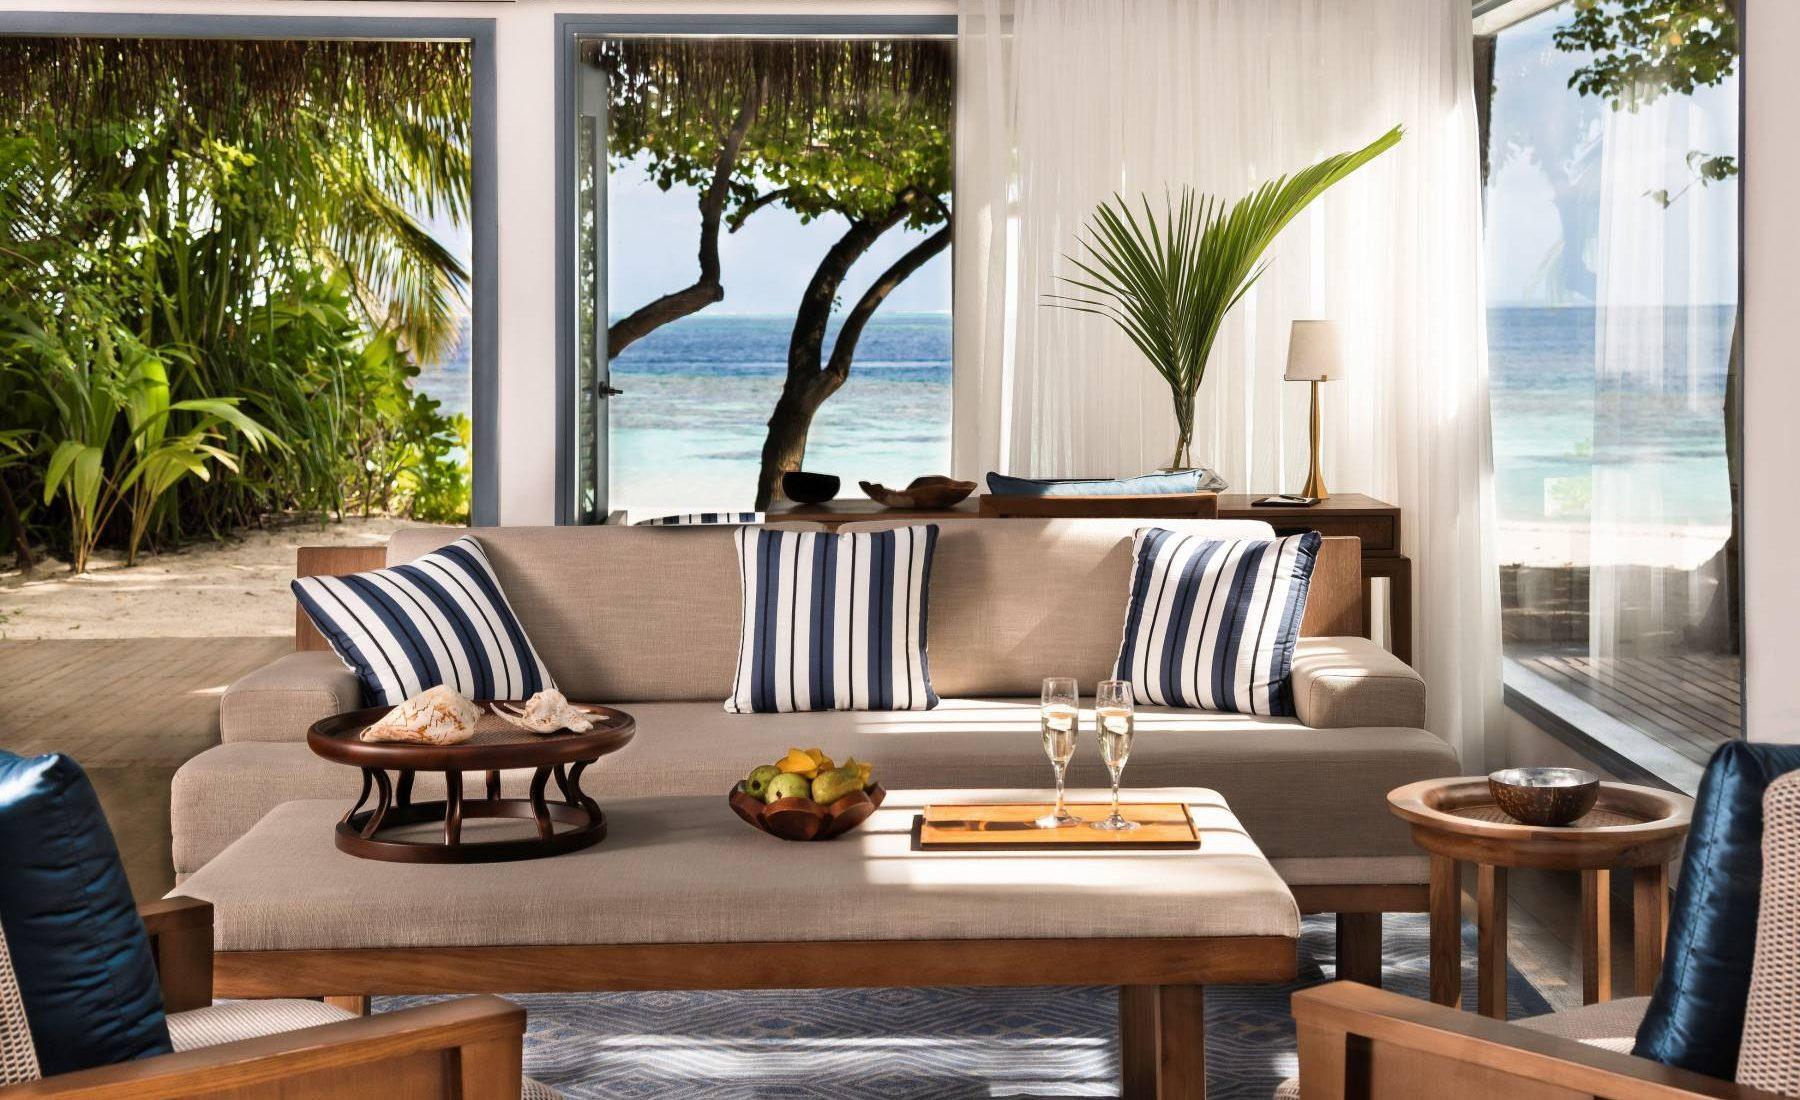 Raffles Maldives Meradhoo - Deluxe Beach Villa with Private Pool